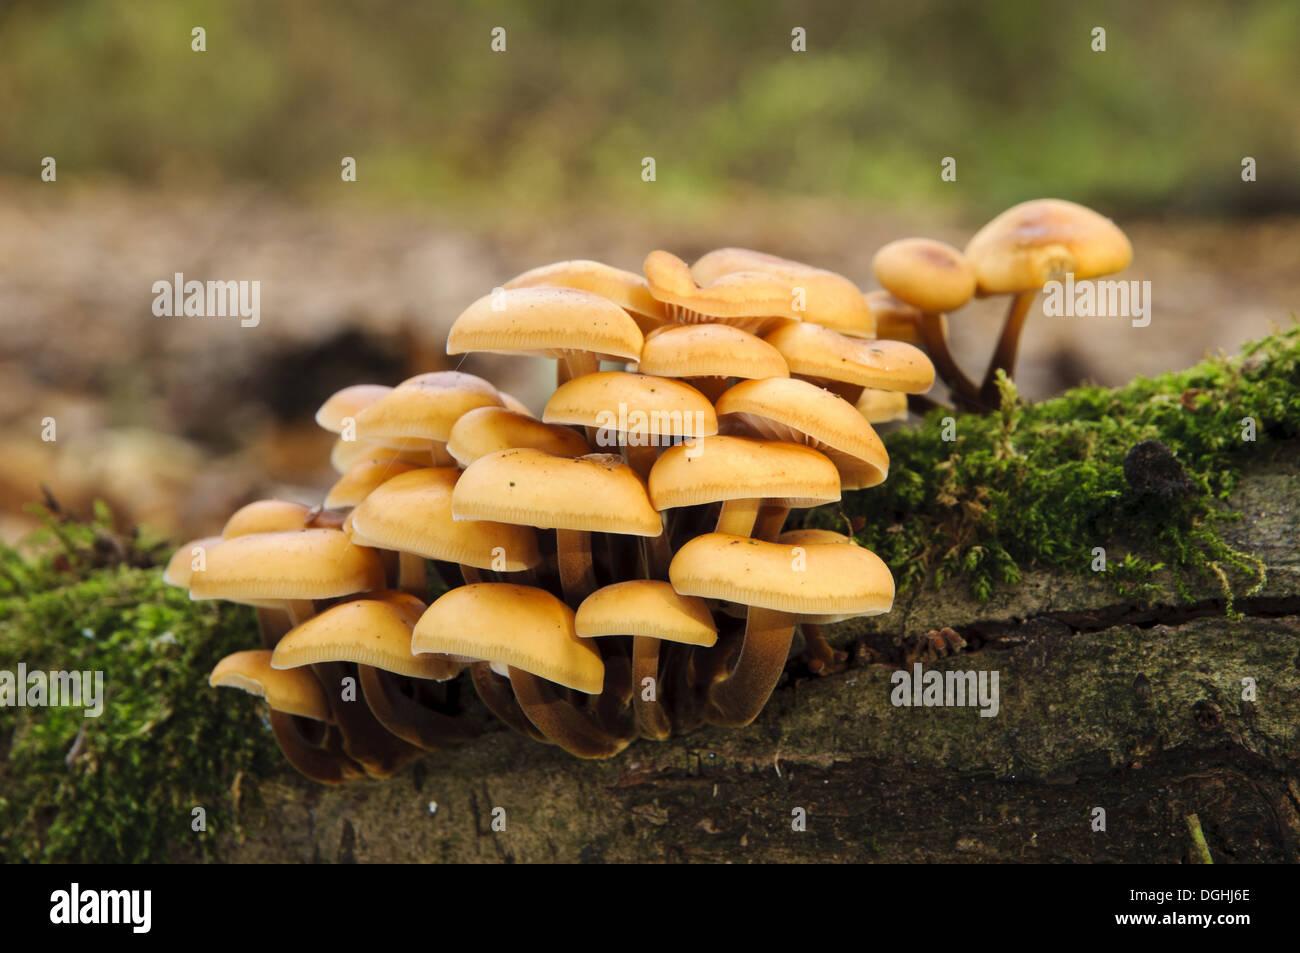 Velvet Shank Fungus (Flammulina velutipes) fruiting bodies growing on moss covered log Titchwell RSPB Reserve Norfolk England - Stock Image